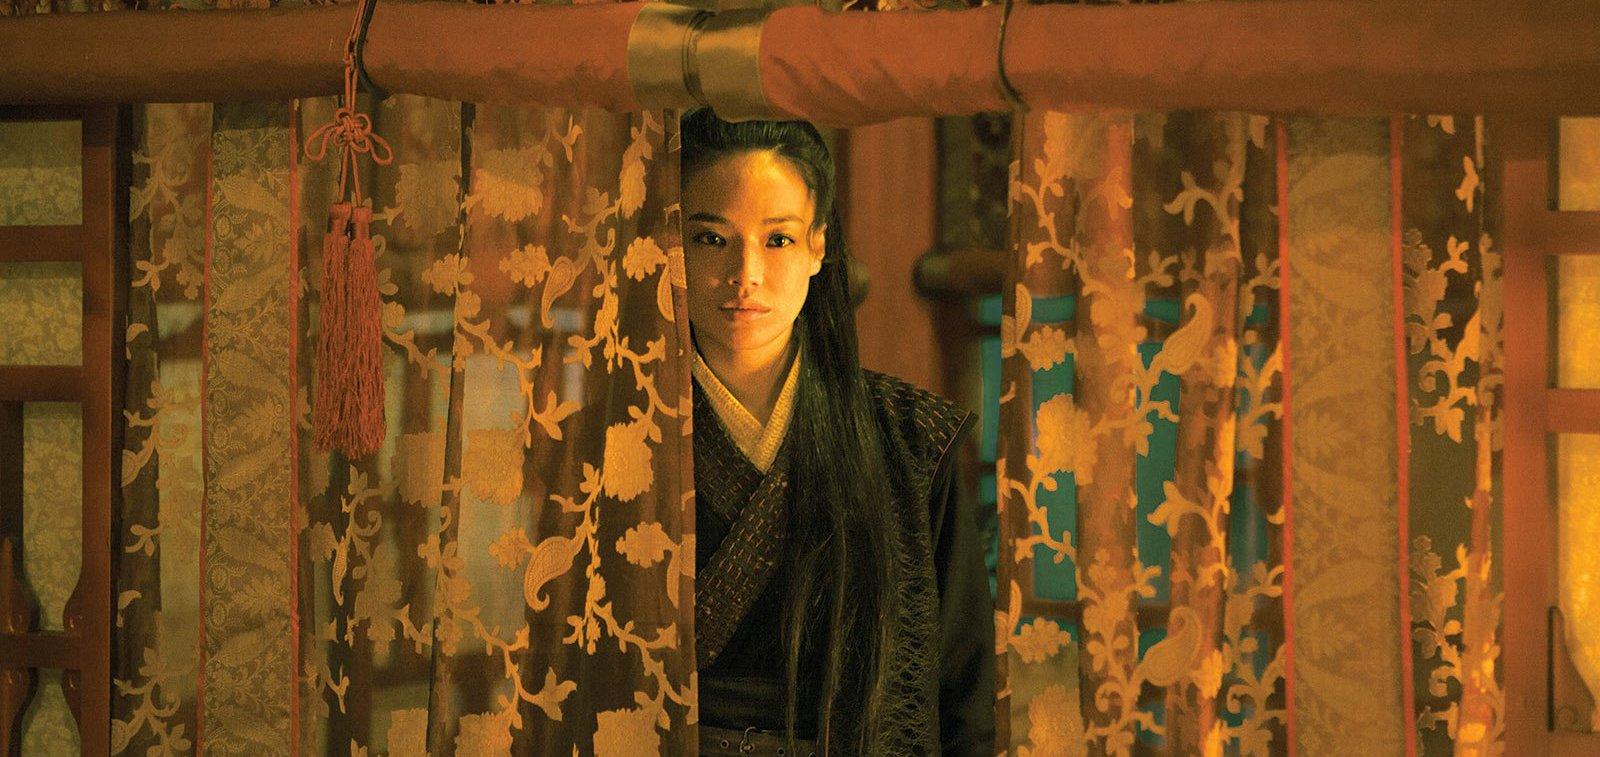 The Assassin - Hou Hsiao-hsien - Shu Qi